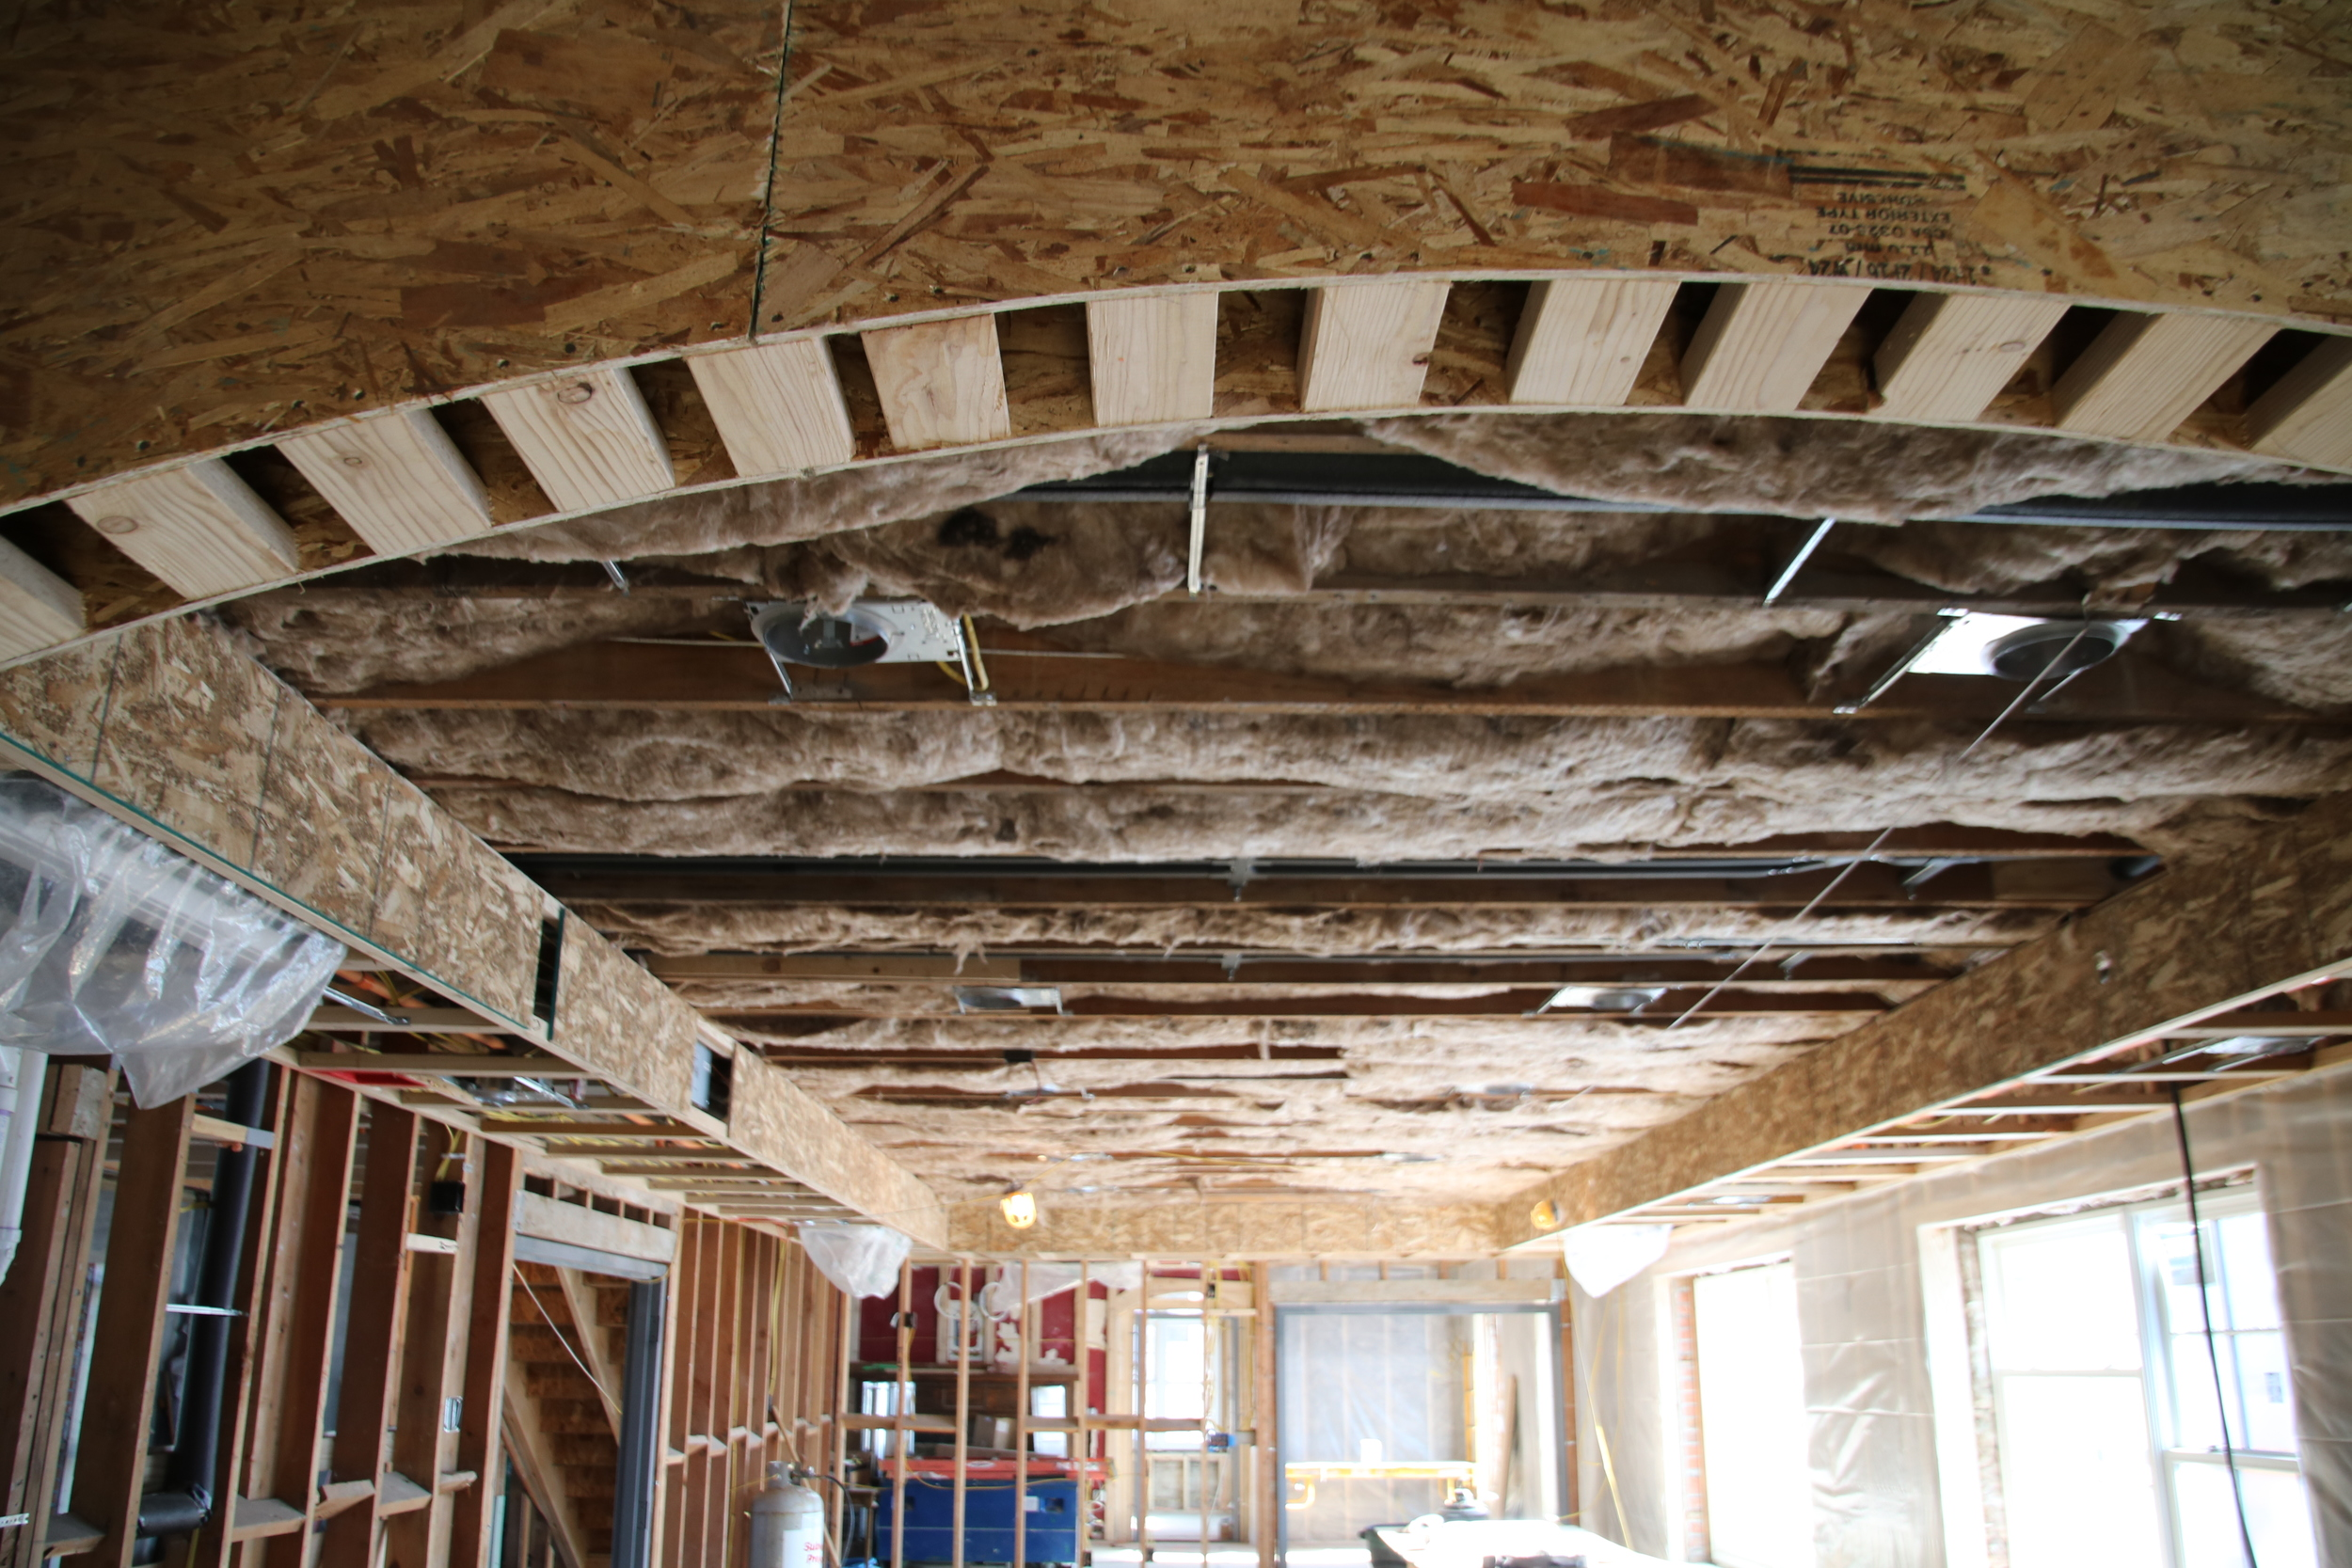 2015-11-18 sound insulation dining room ceiling.JPG